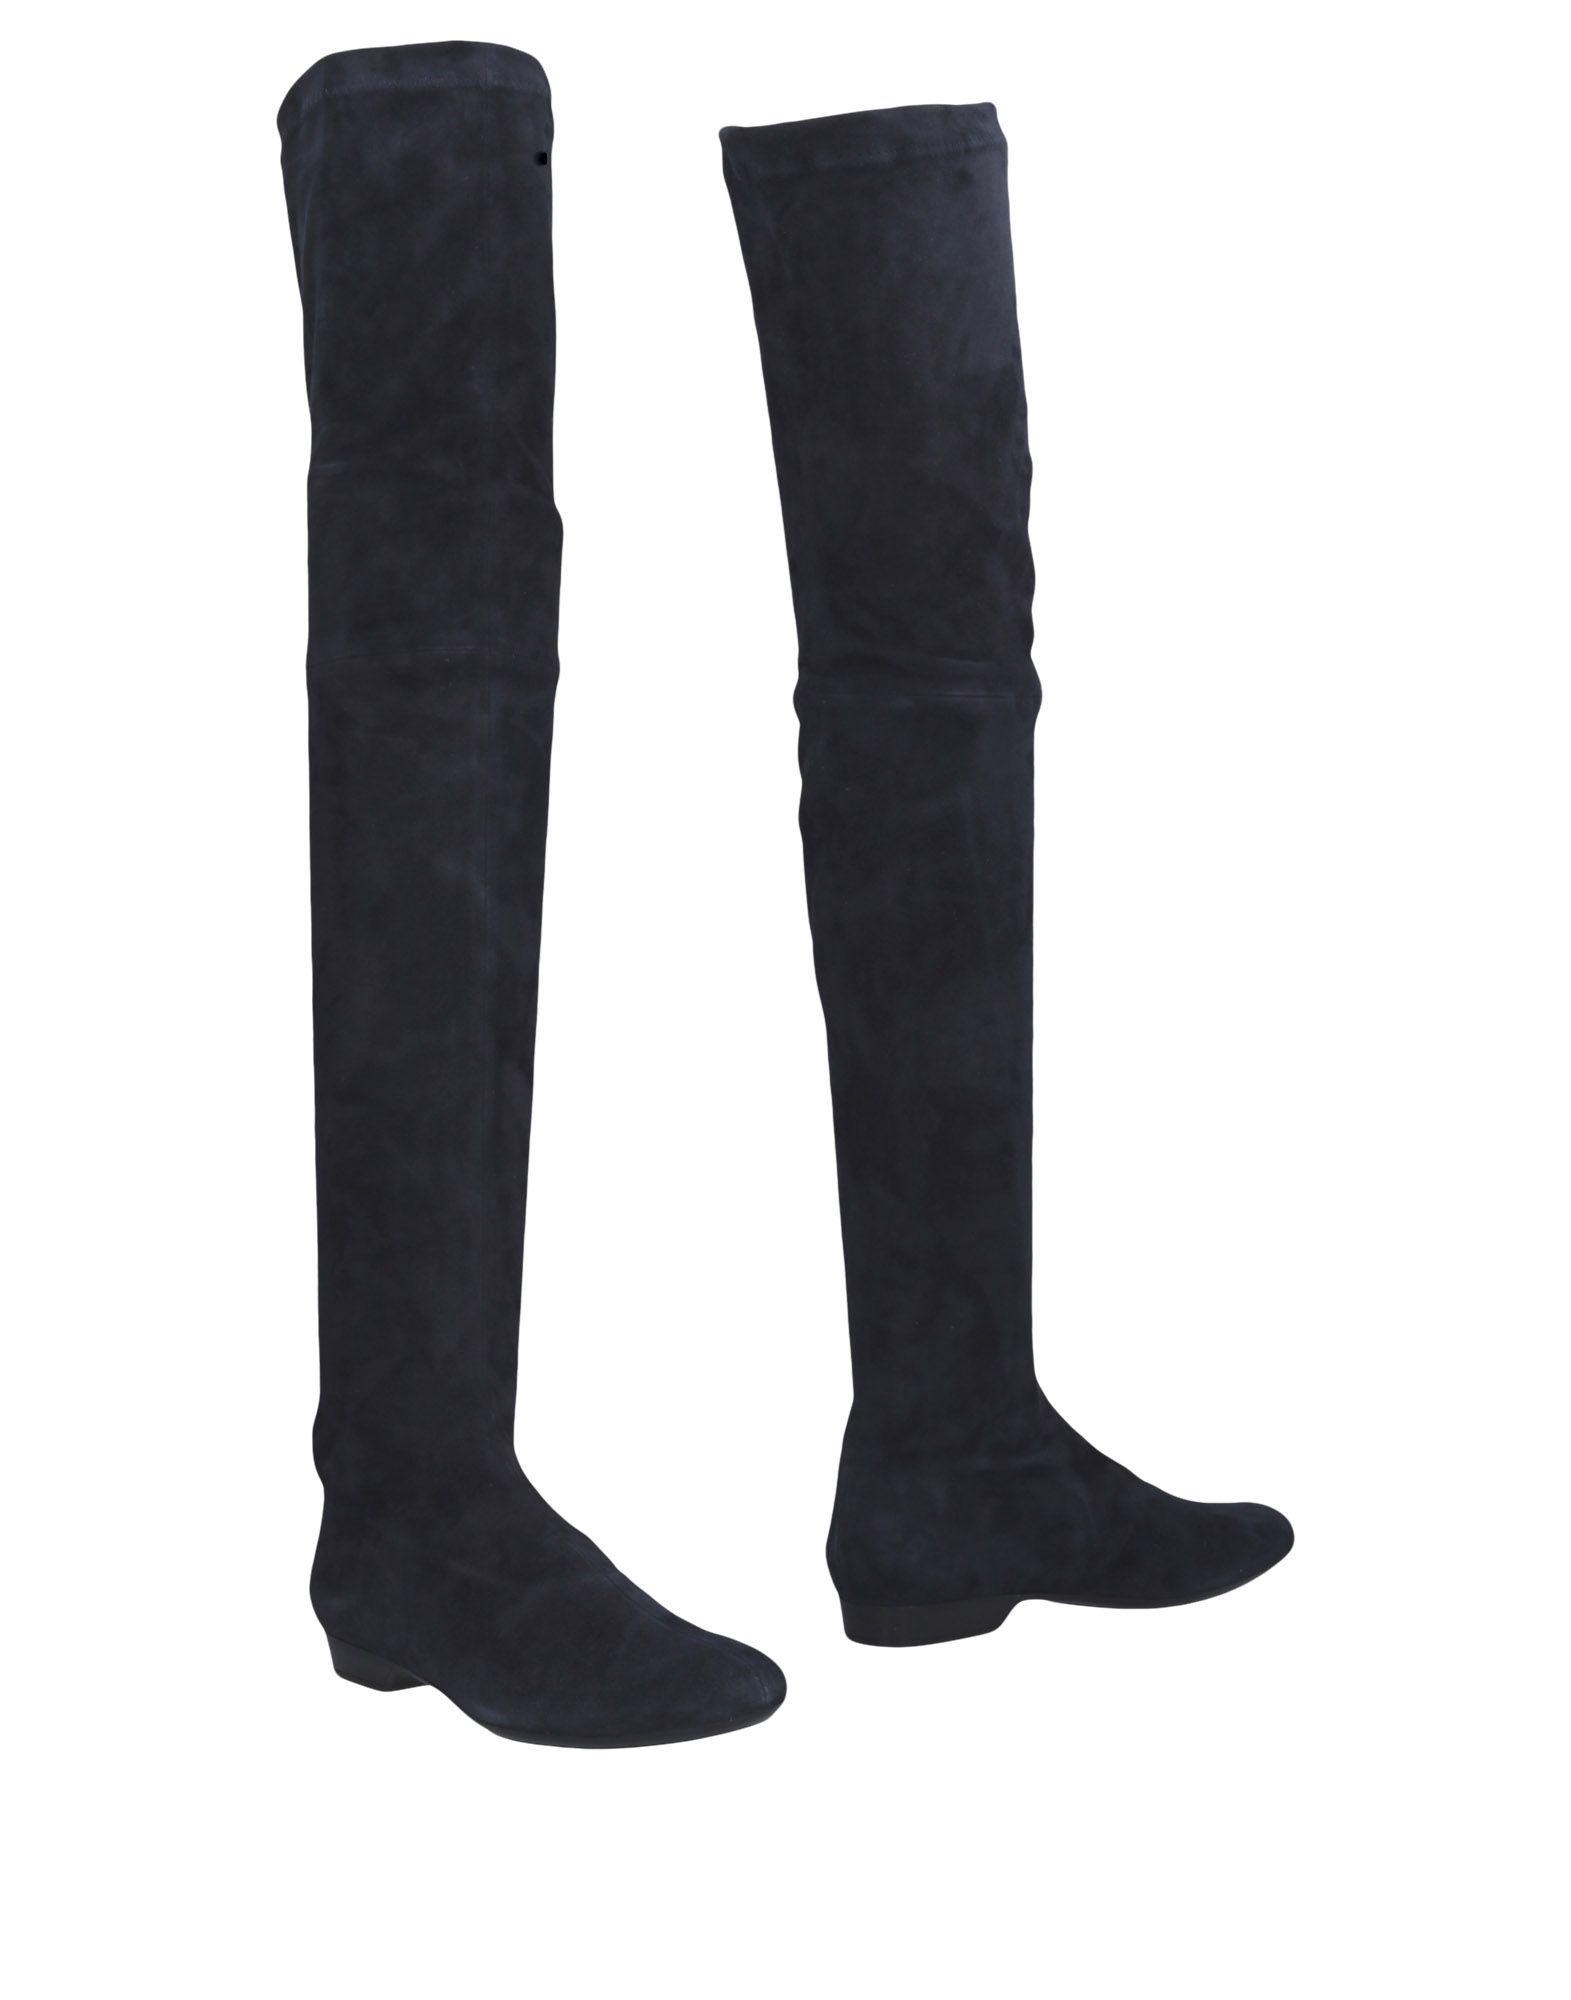 Robert Clergerie Boots - Women on Robert Clergerie Boots online on Women  United Kingdom - 11435834AA fc0c11